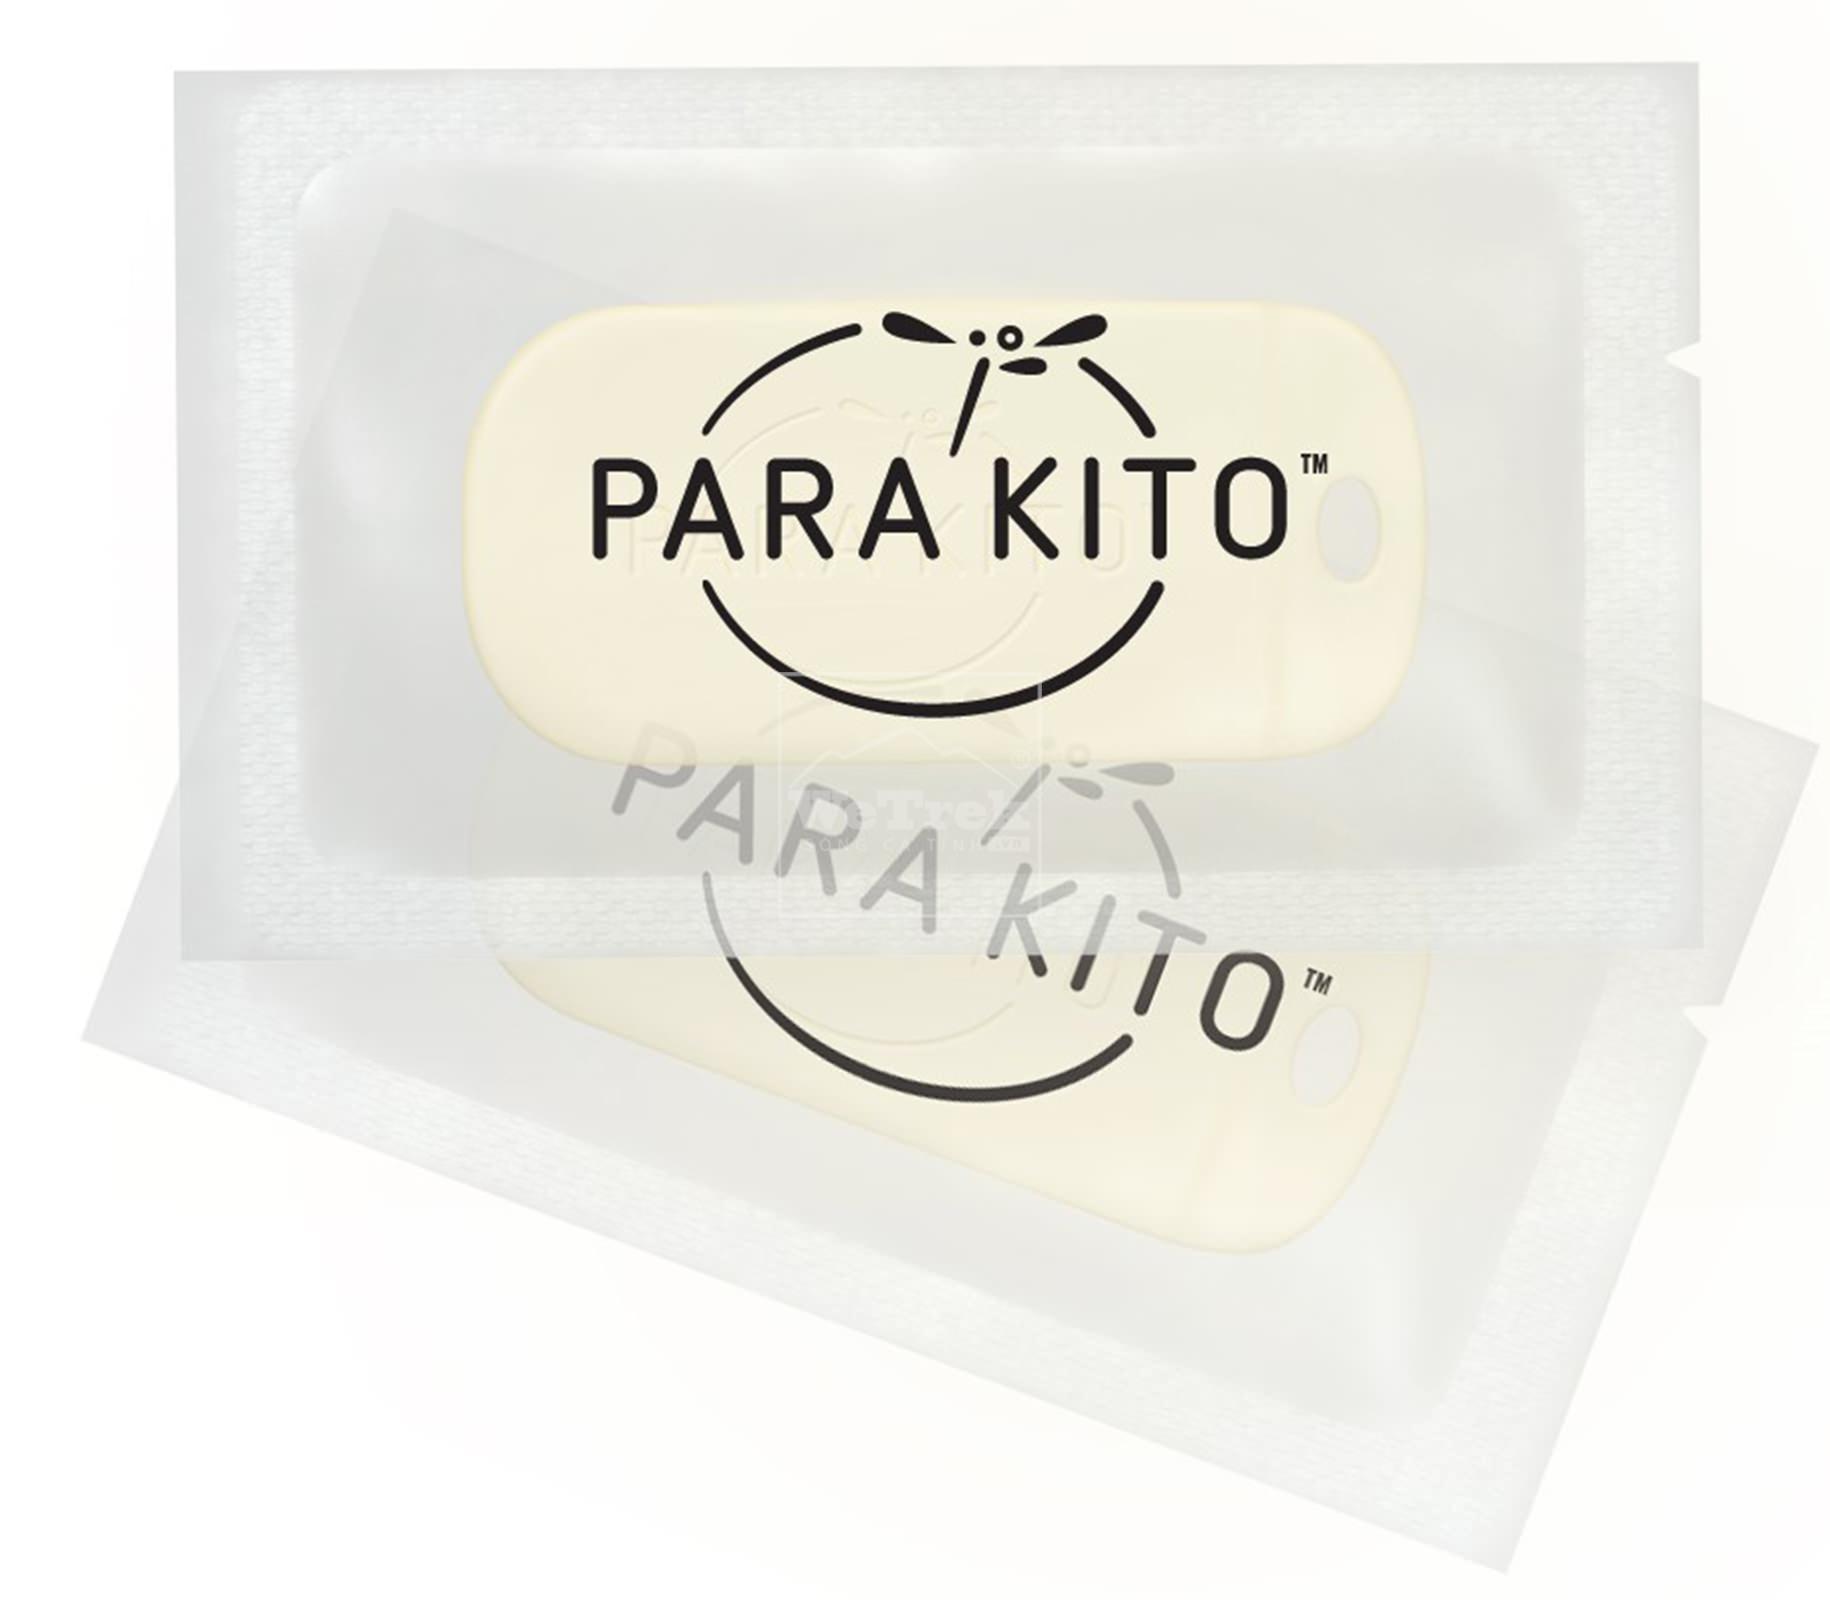 vien-chong-muoi-kem-moc-cai-parakito-dot-clip-7654-wetrek.vn-2